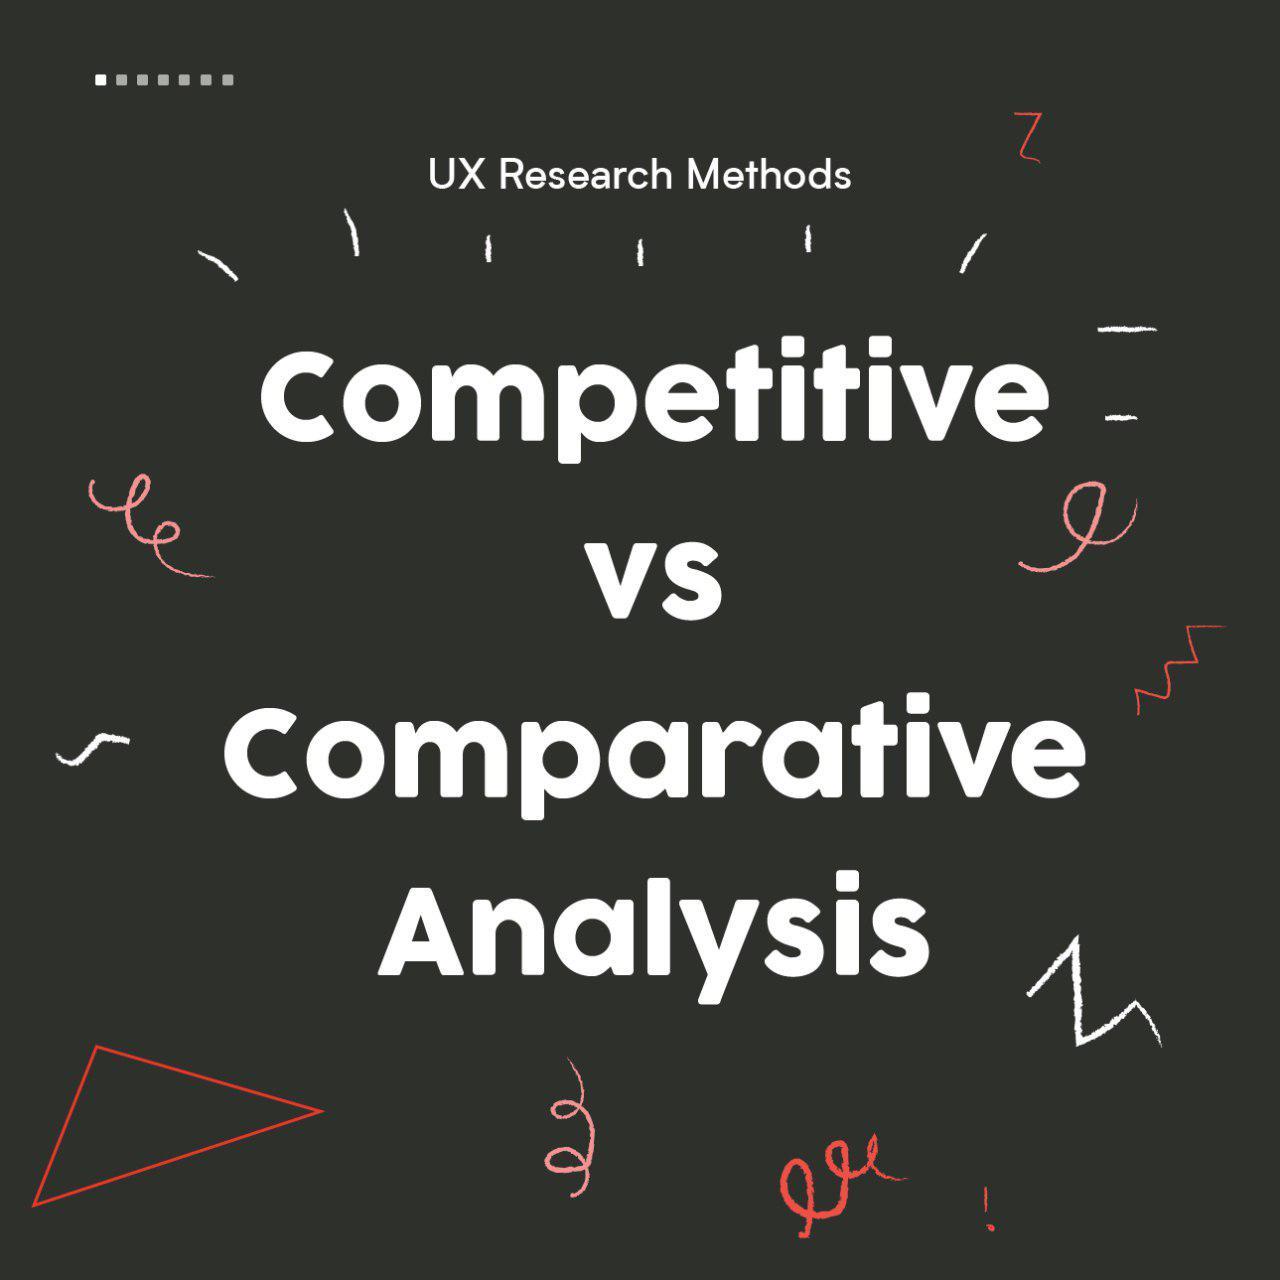 CompetitiveVSComparative